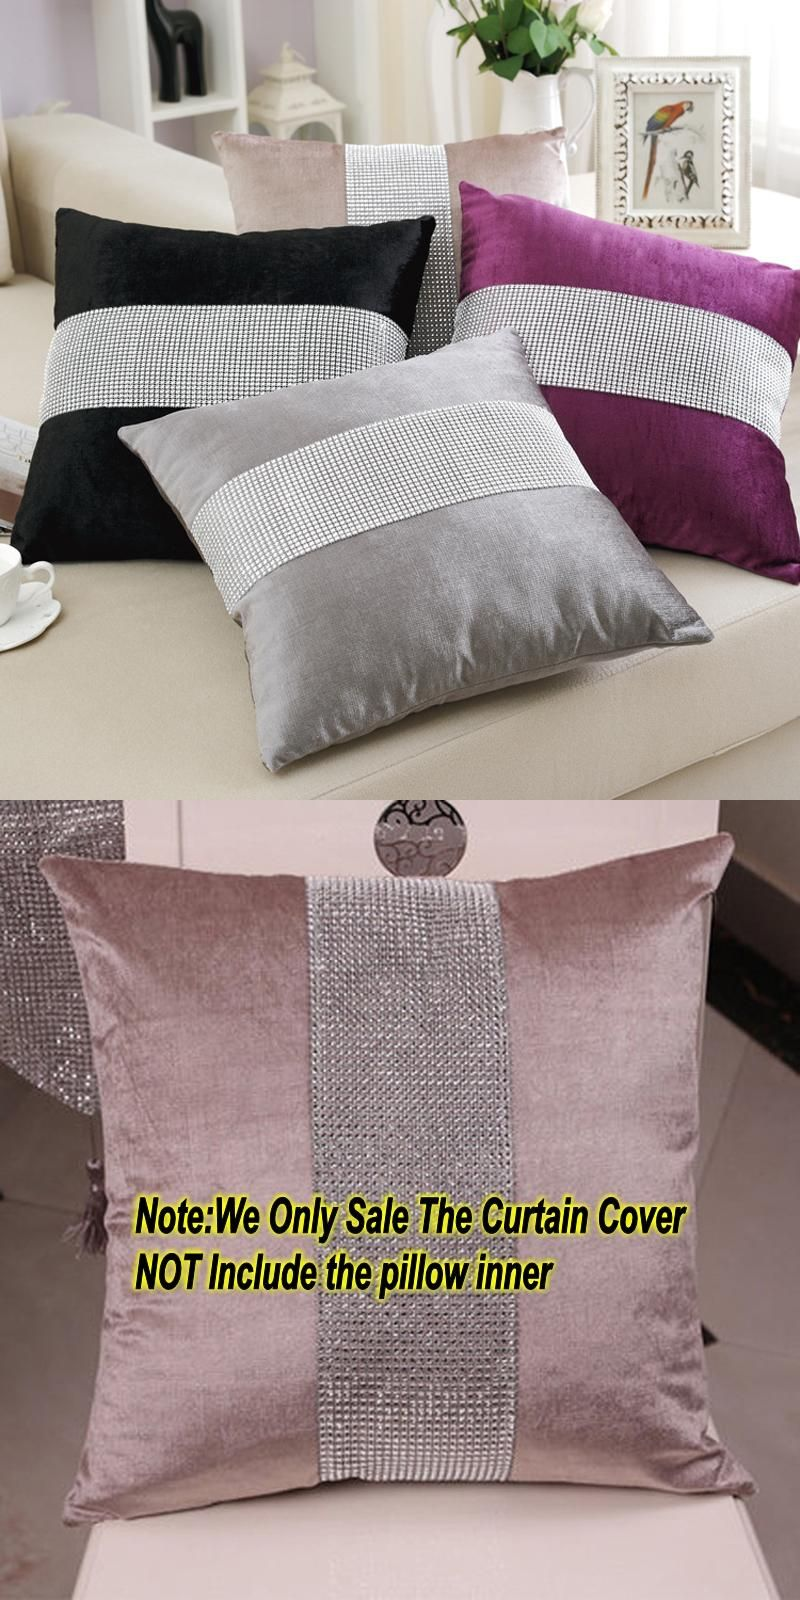 Visit To Buy 45 45cm Quality Stylish Diamond Velvet Cushion Sofa Bed Pillow Modern Minimalist Hotel Cushion Advertise Cushions On Sofa Bed Pillows